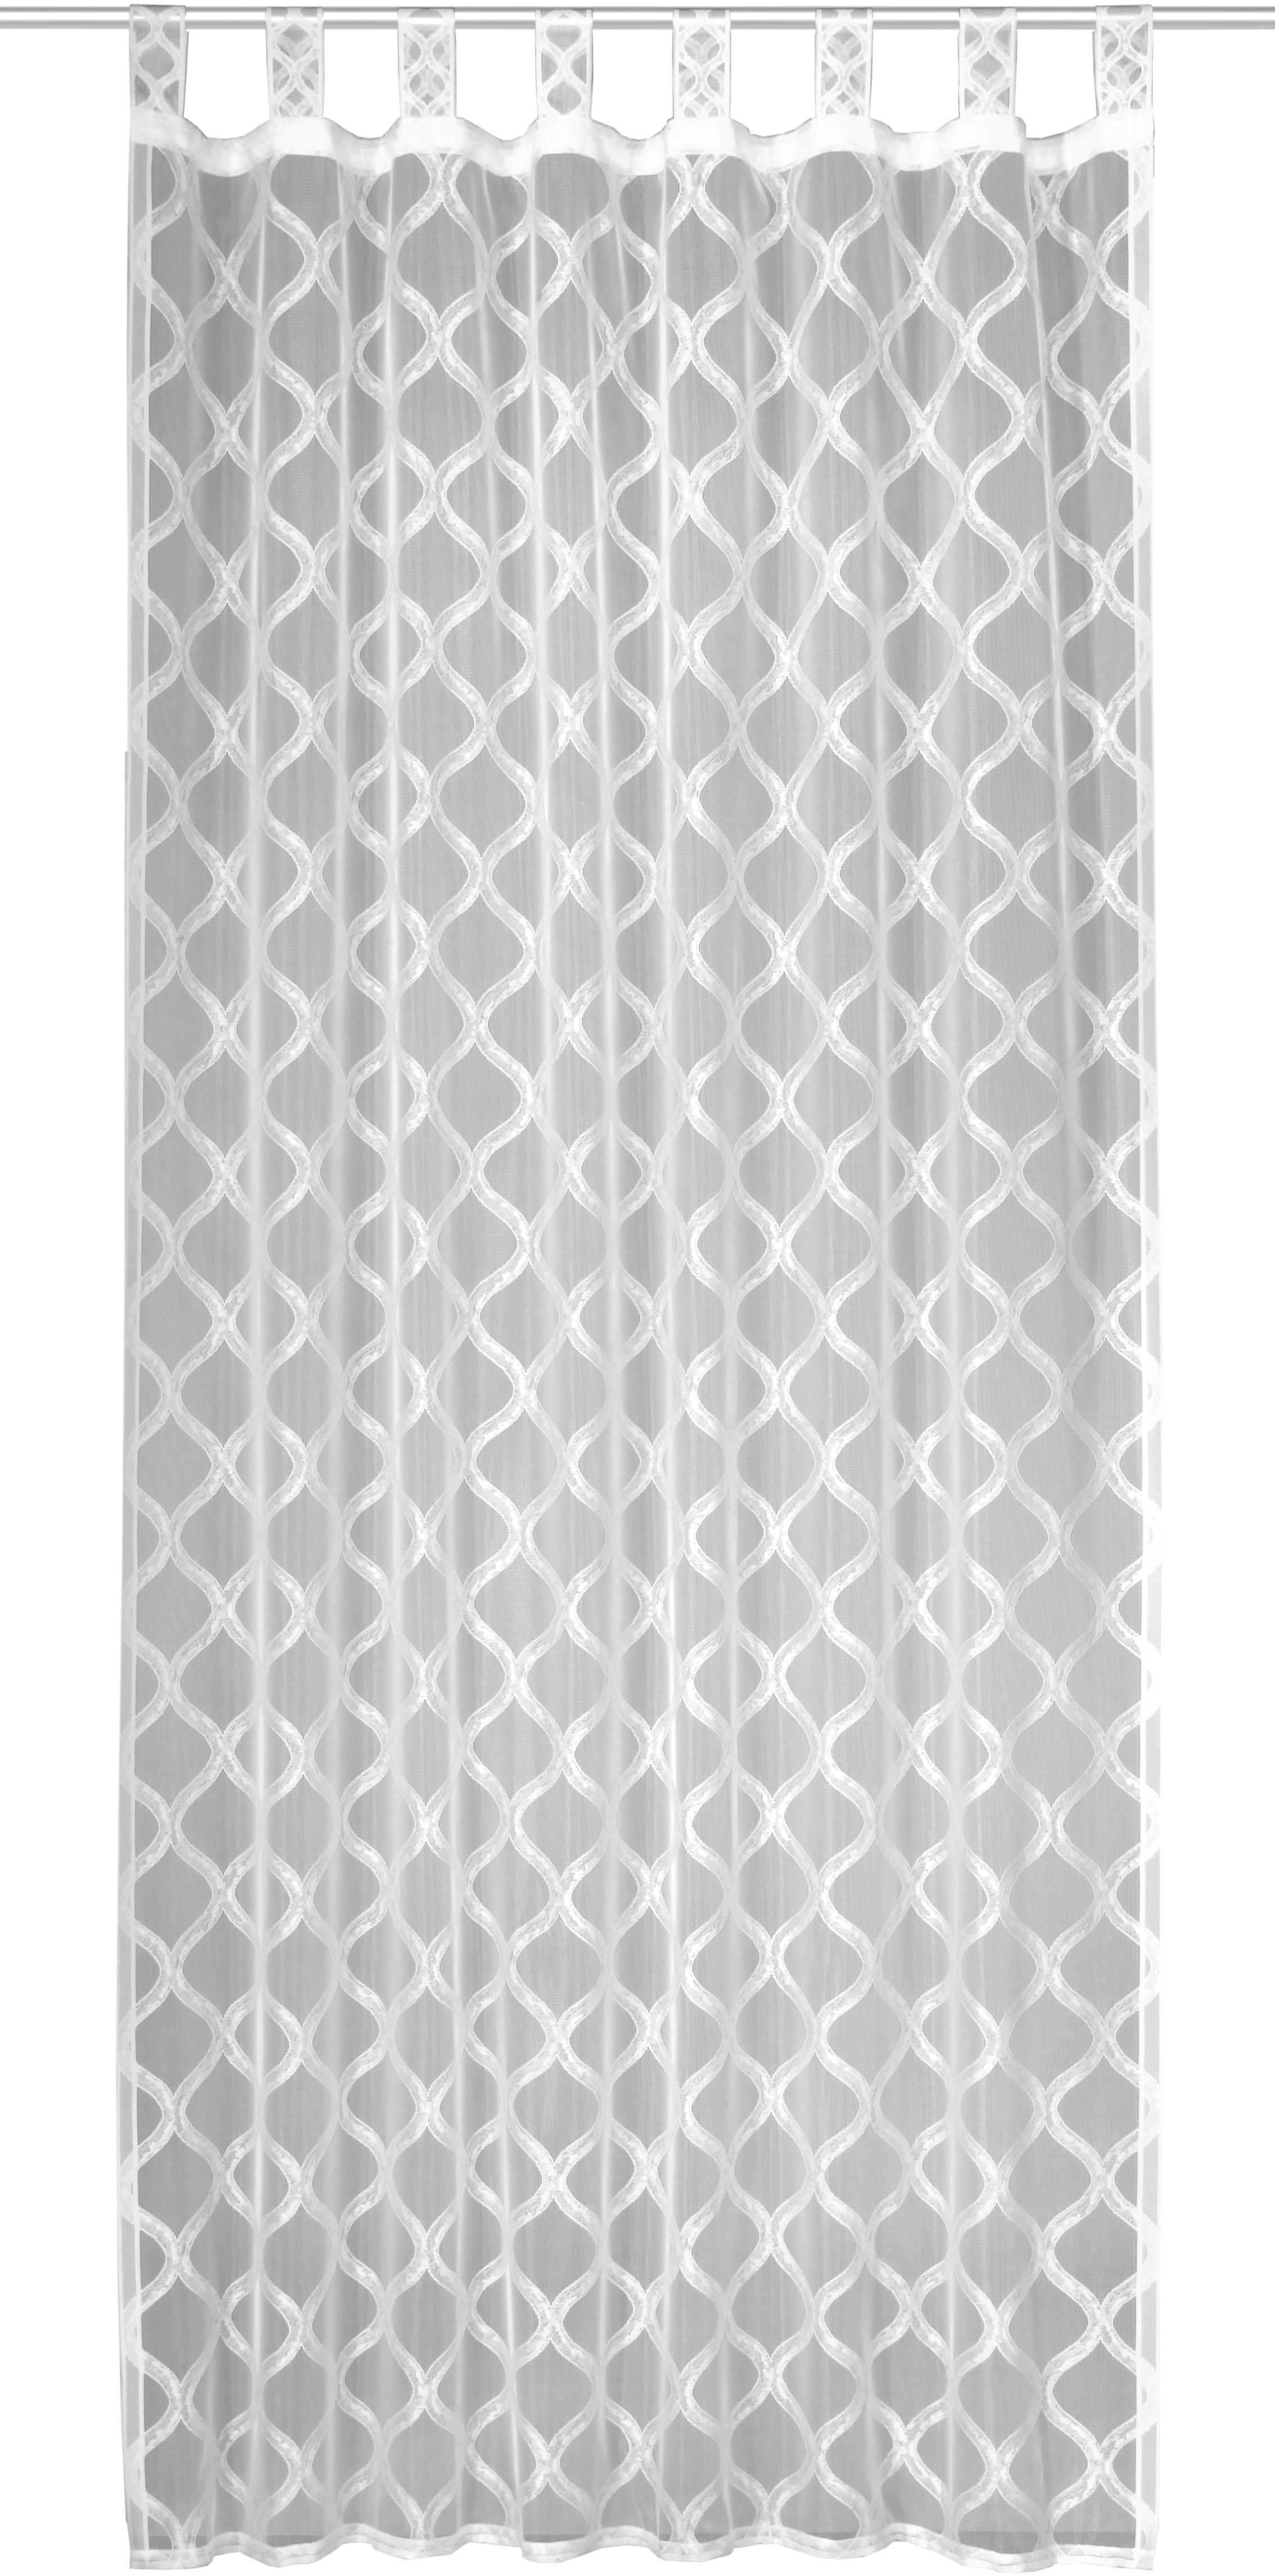 WILLKOMMEN ZUHAUSE by ALBANI GROUP gordijn Bühl HxB: 245x140, lussjaal met rimpelband (1 stuk) veilig op otto.nl kopen